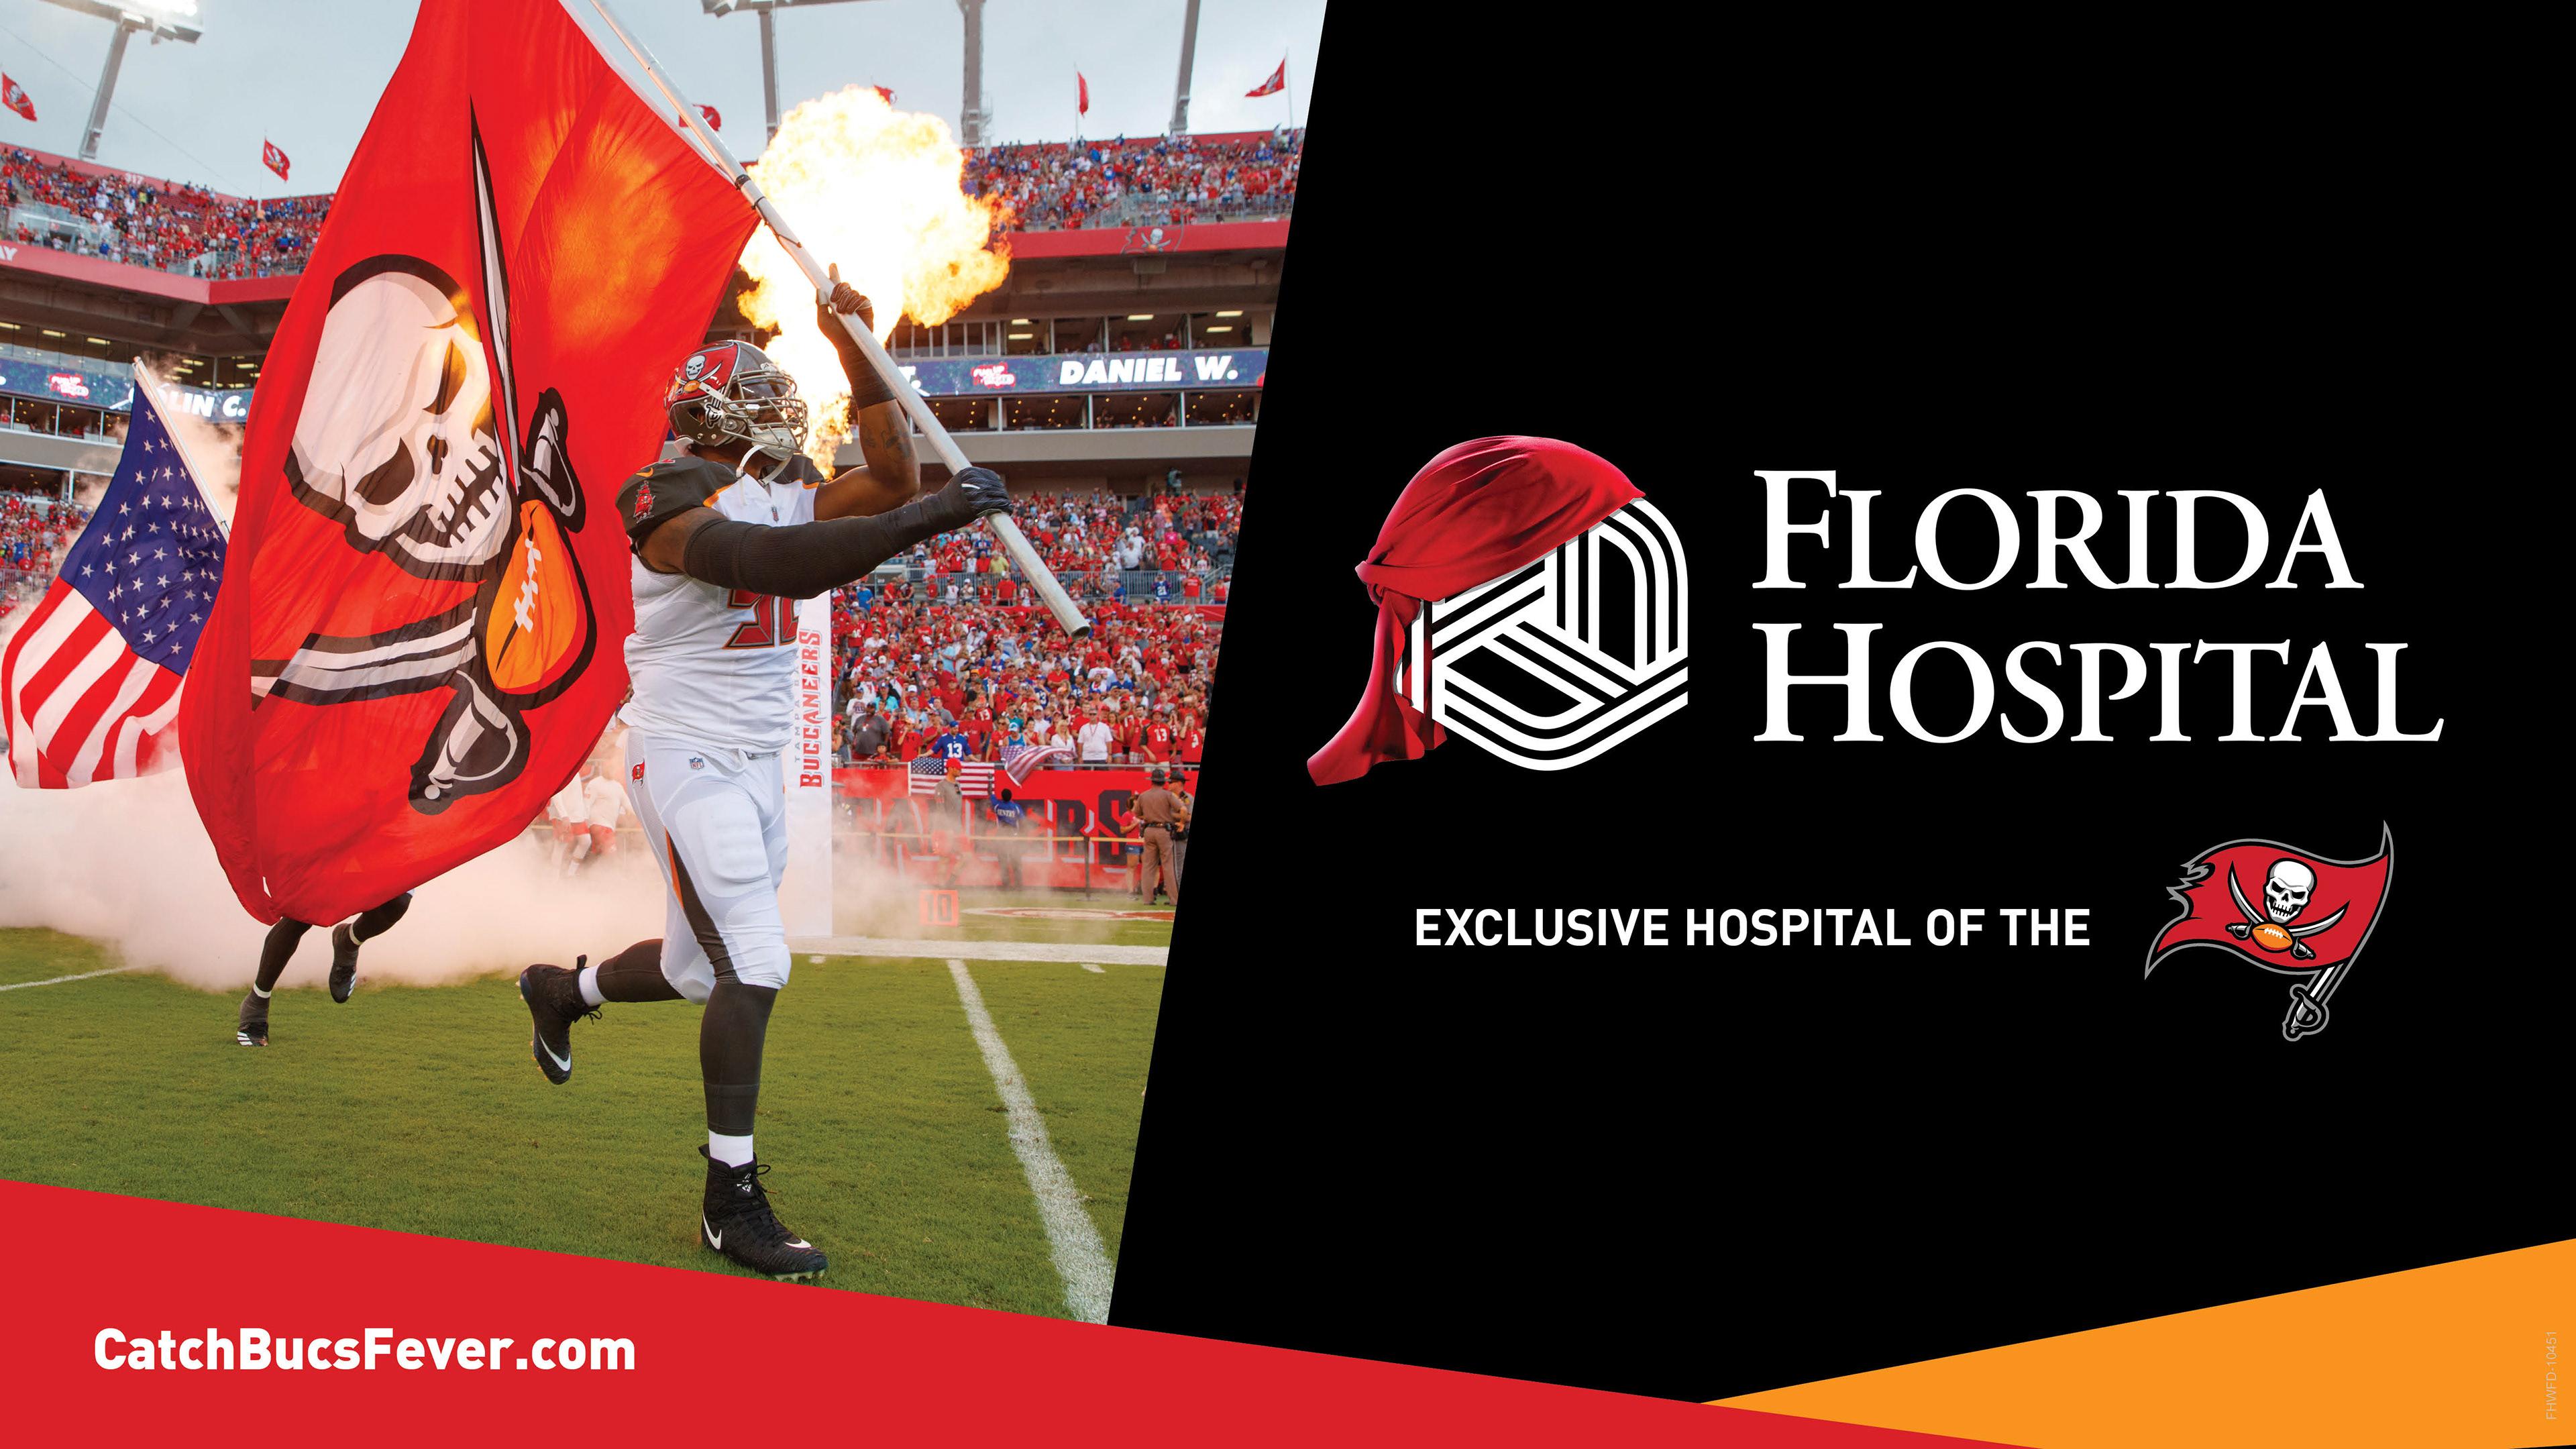 Klaus Herdocia Creative Direction - NFL Tampa Bay Bucs 8a09749d6